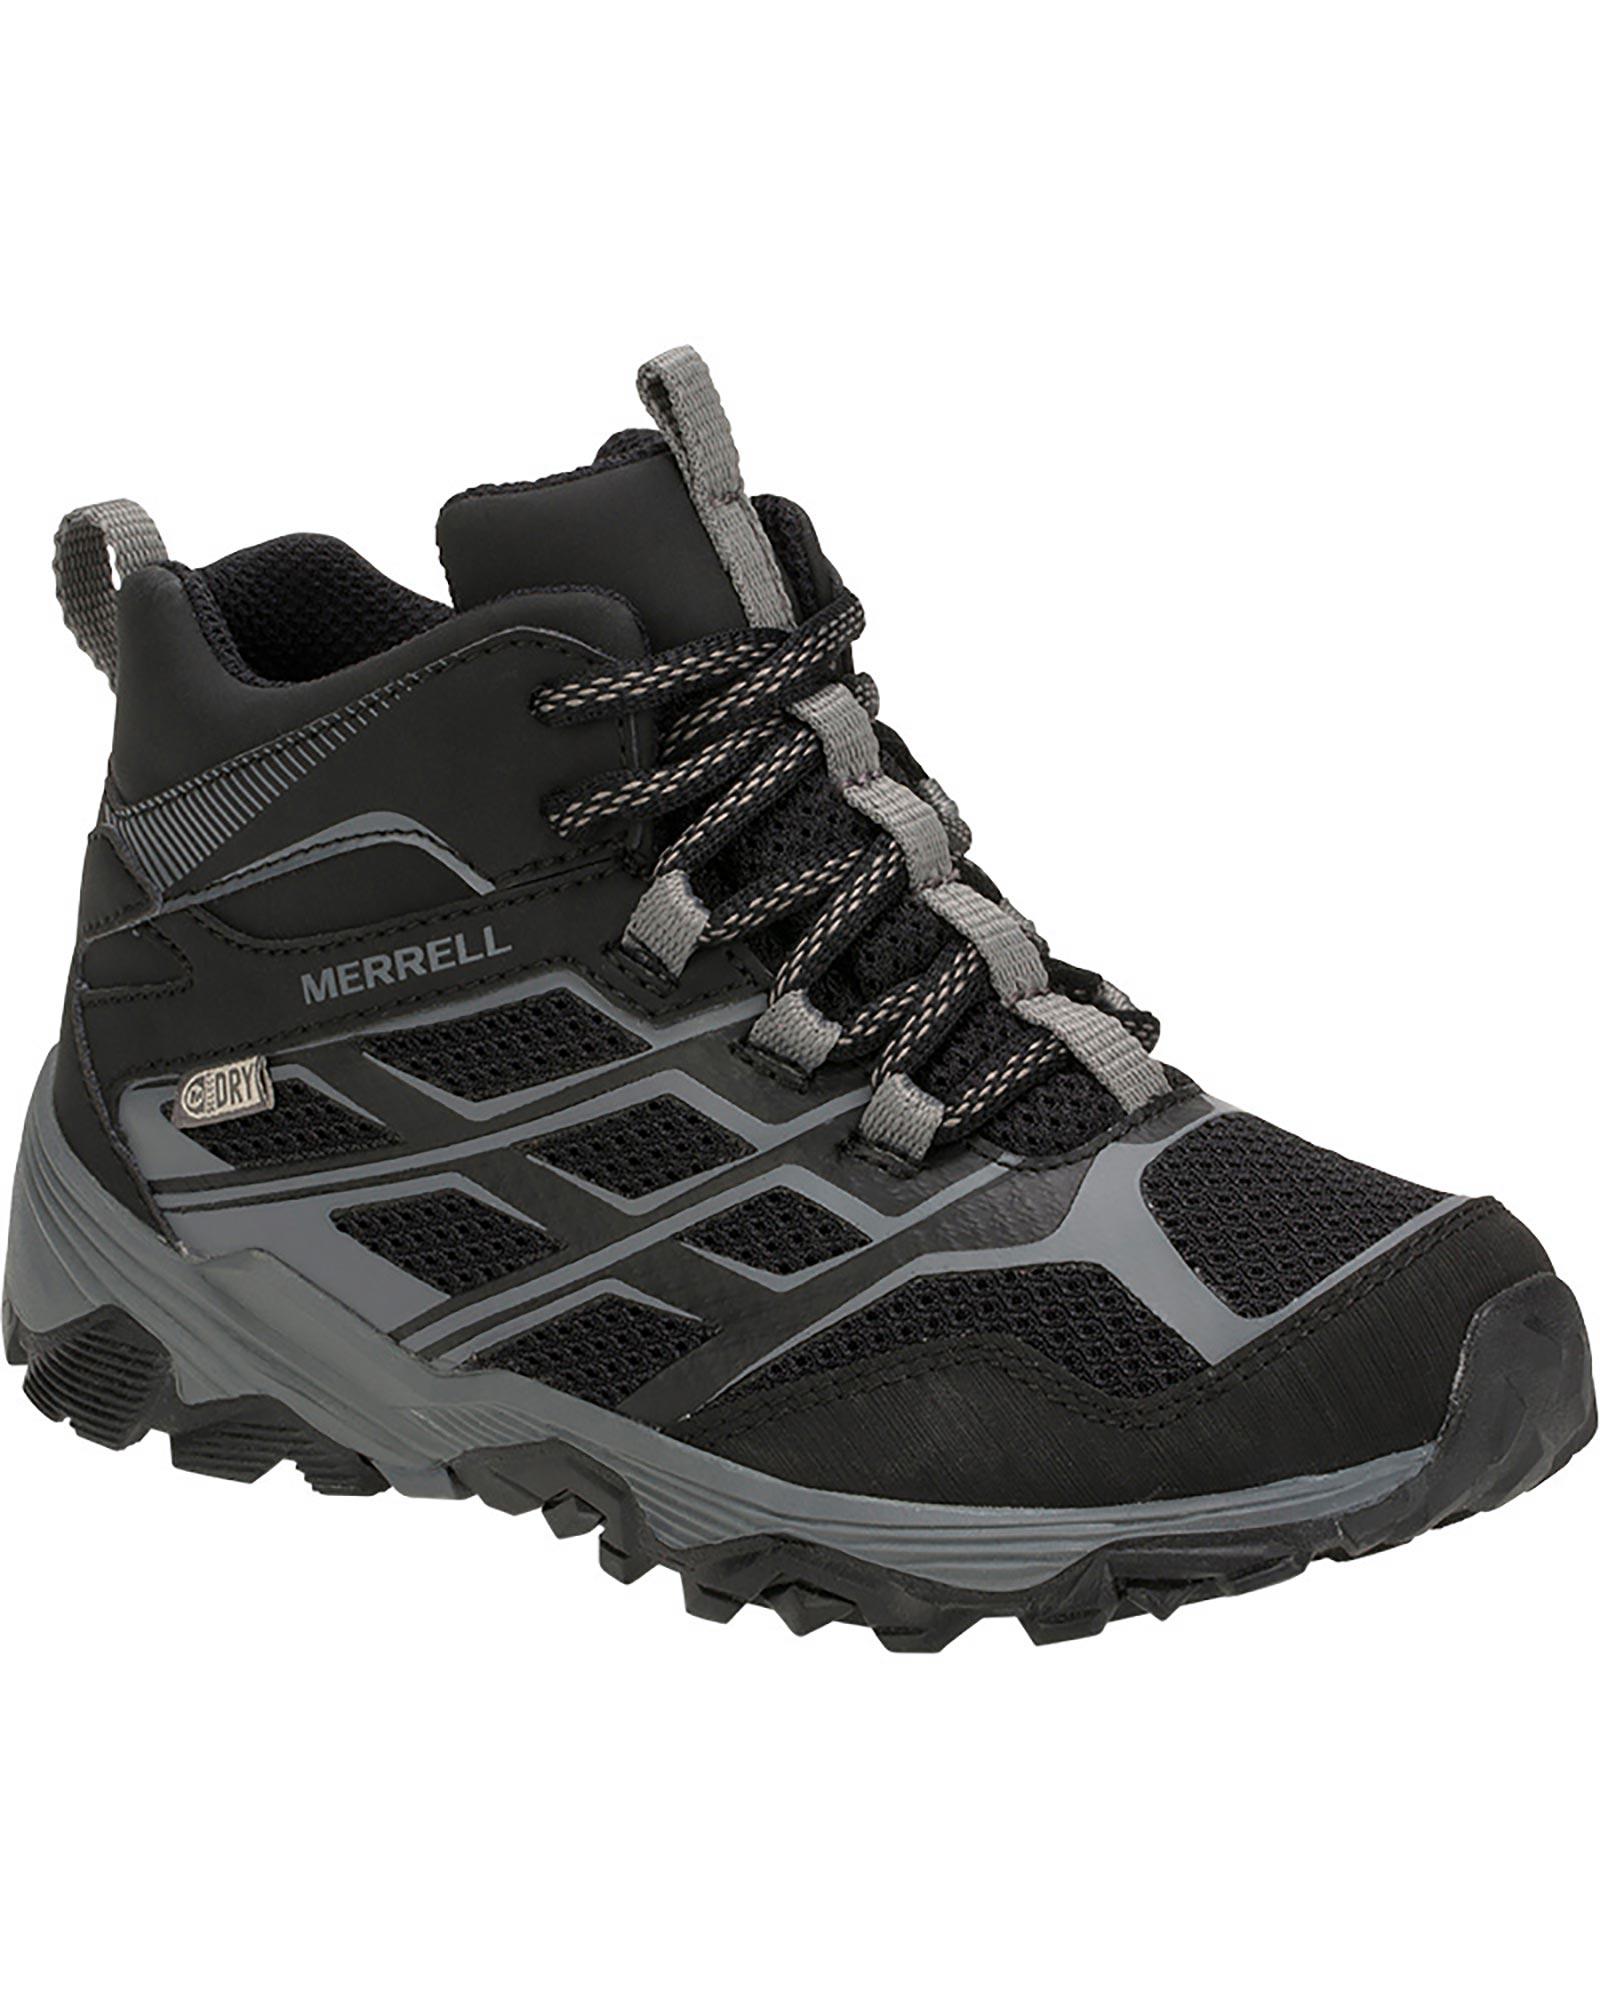 Merrell Moab FST Kids' Mid Waterproof Boots 0